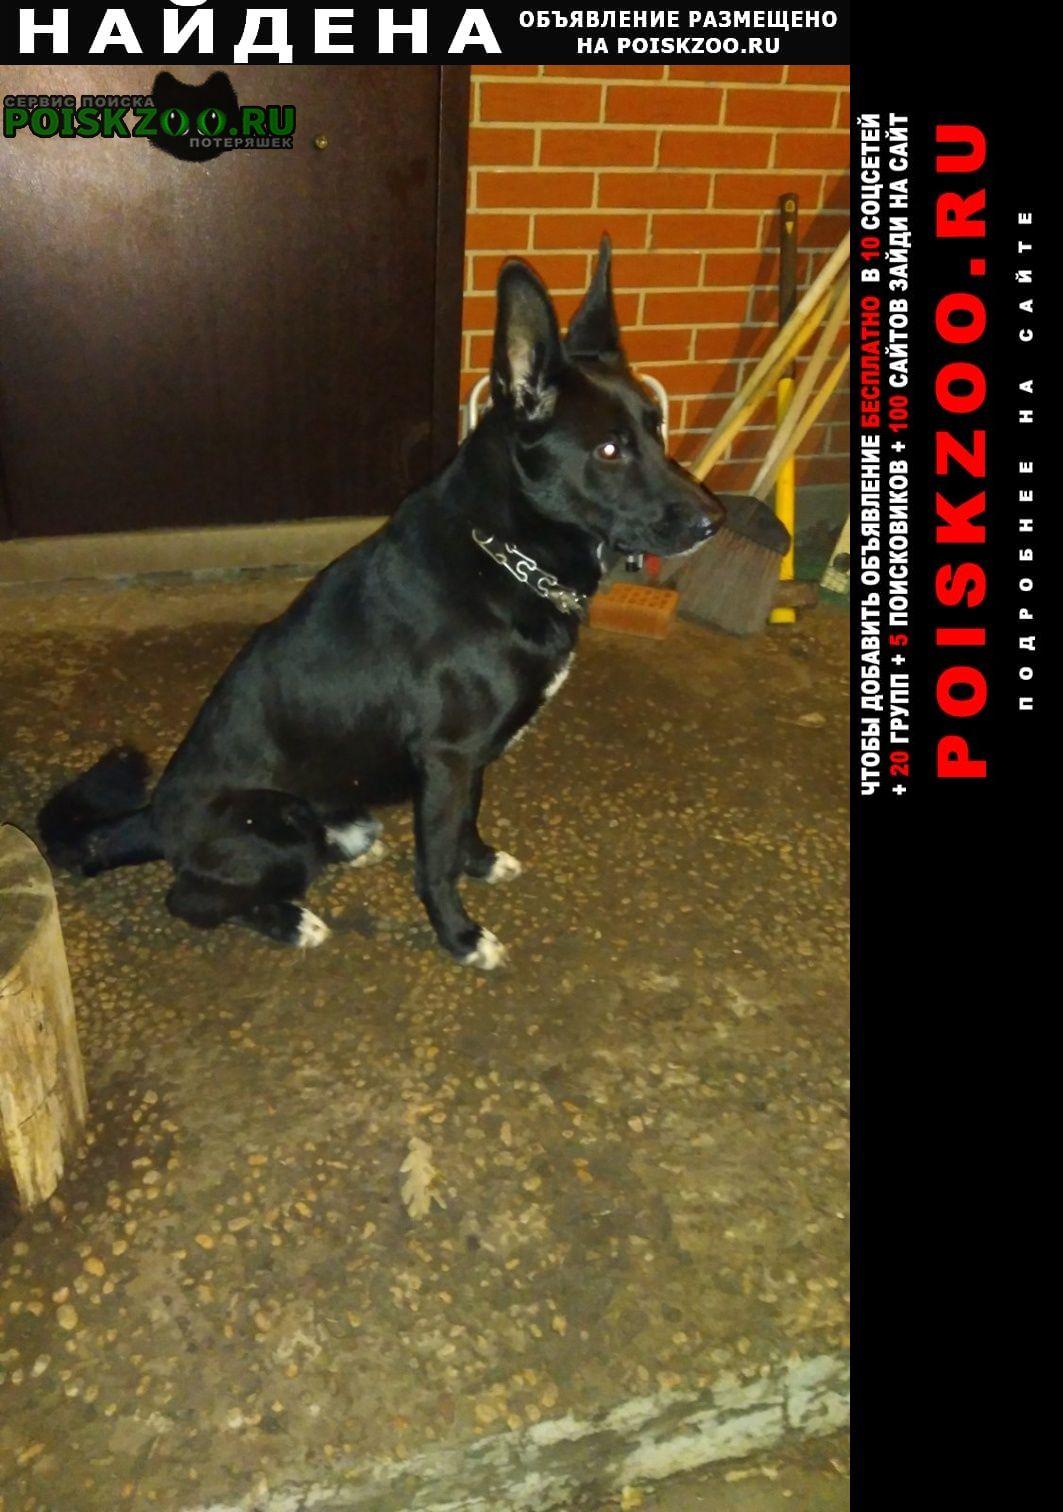 Найдена собака прибилась, черный кобель овчарки. Белгород